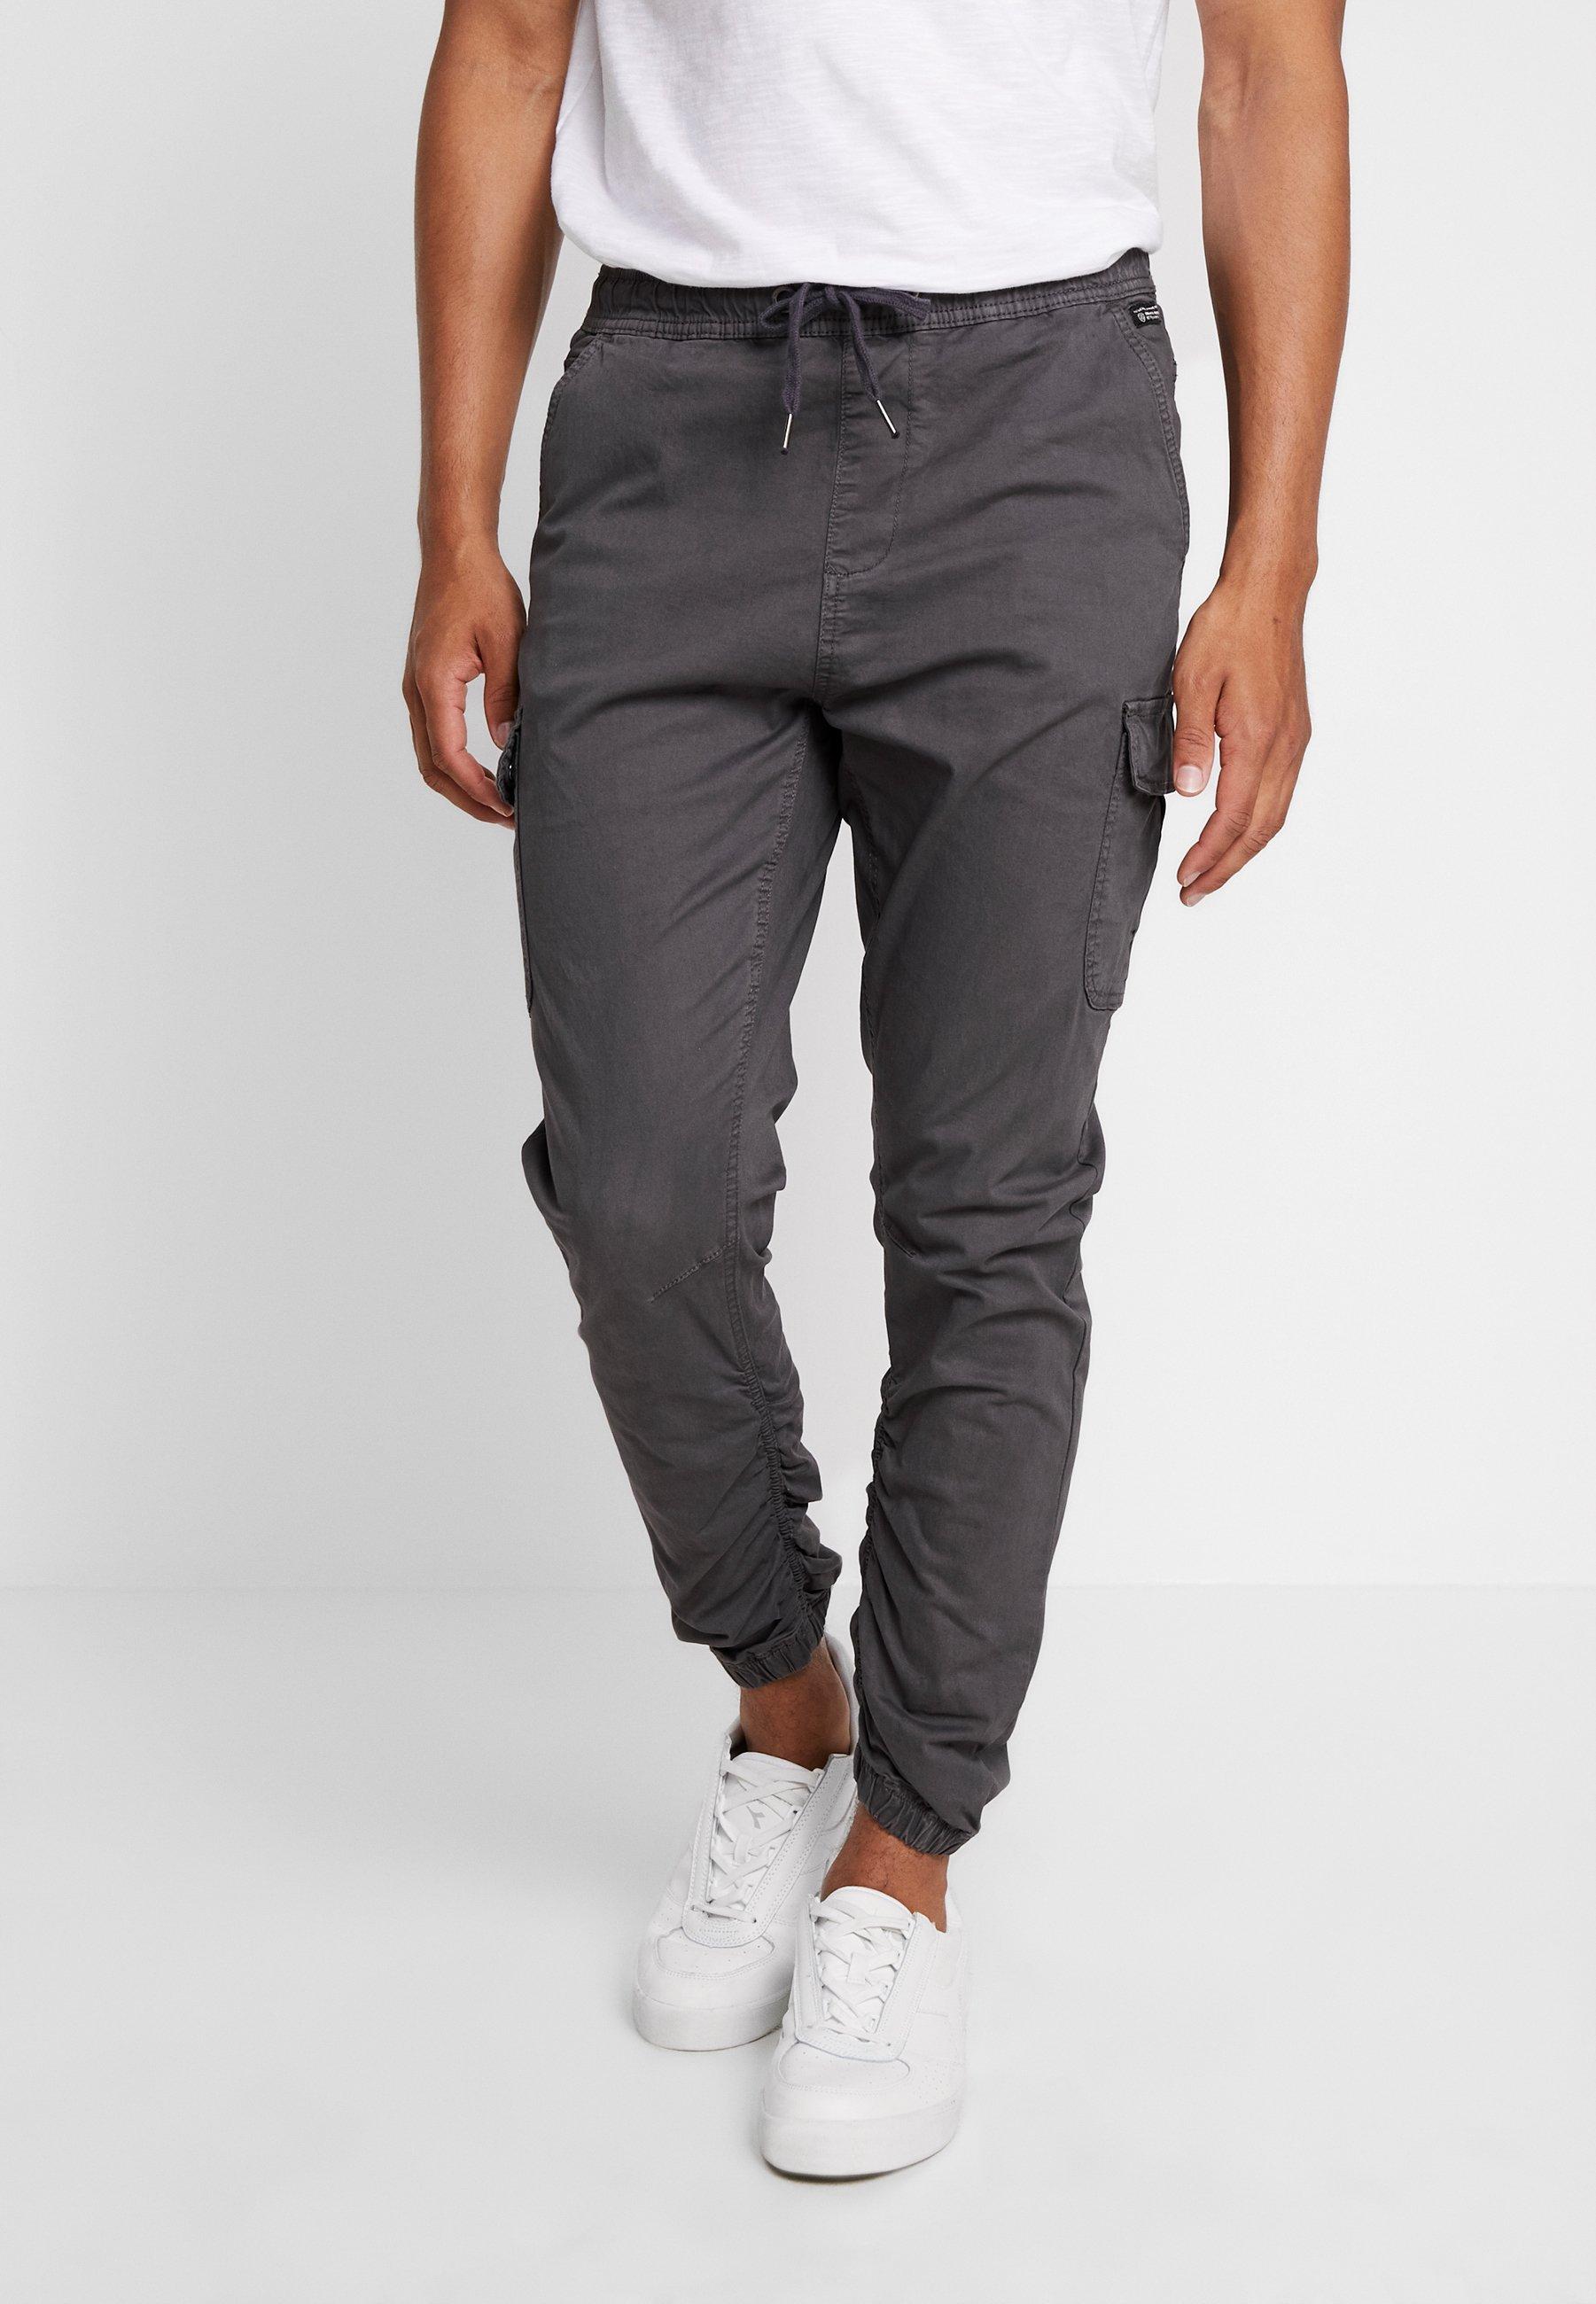 Cargo Jeans Grey Indicode LakelandPantalon Dark xtQrdshC